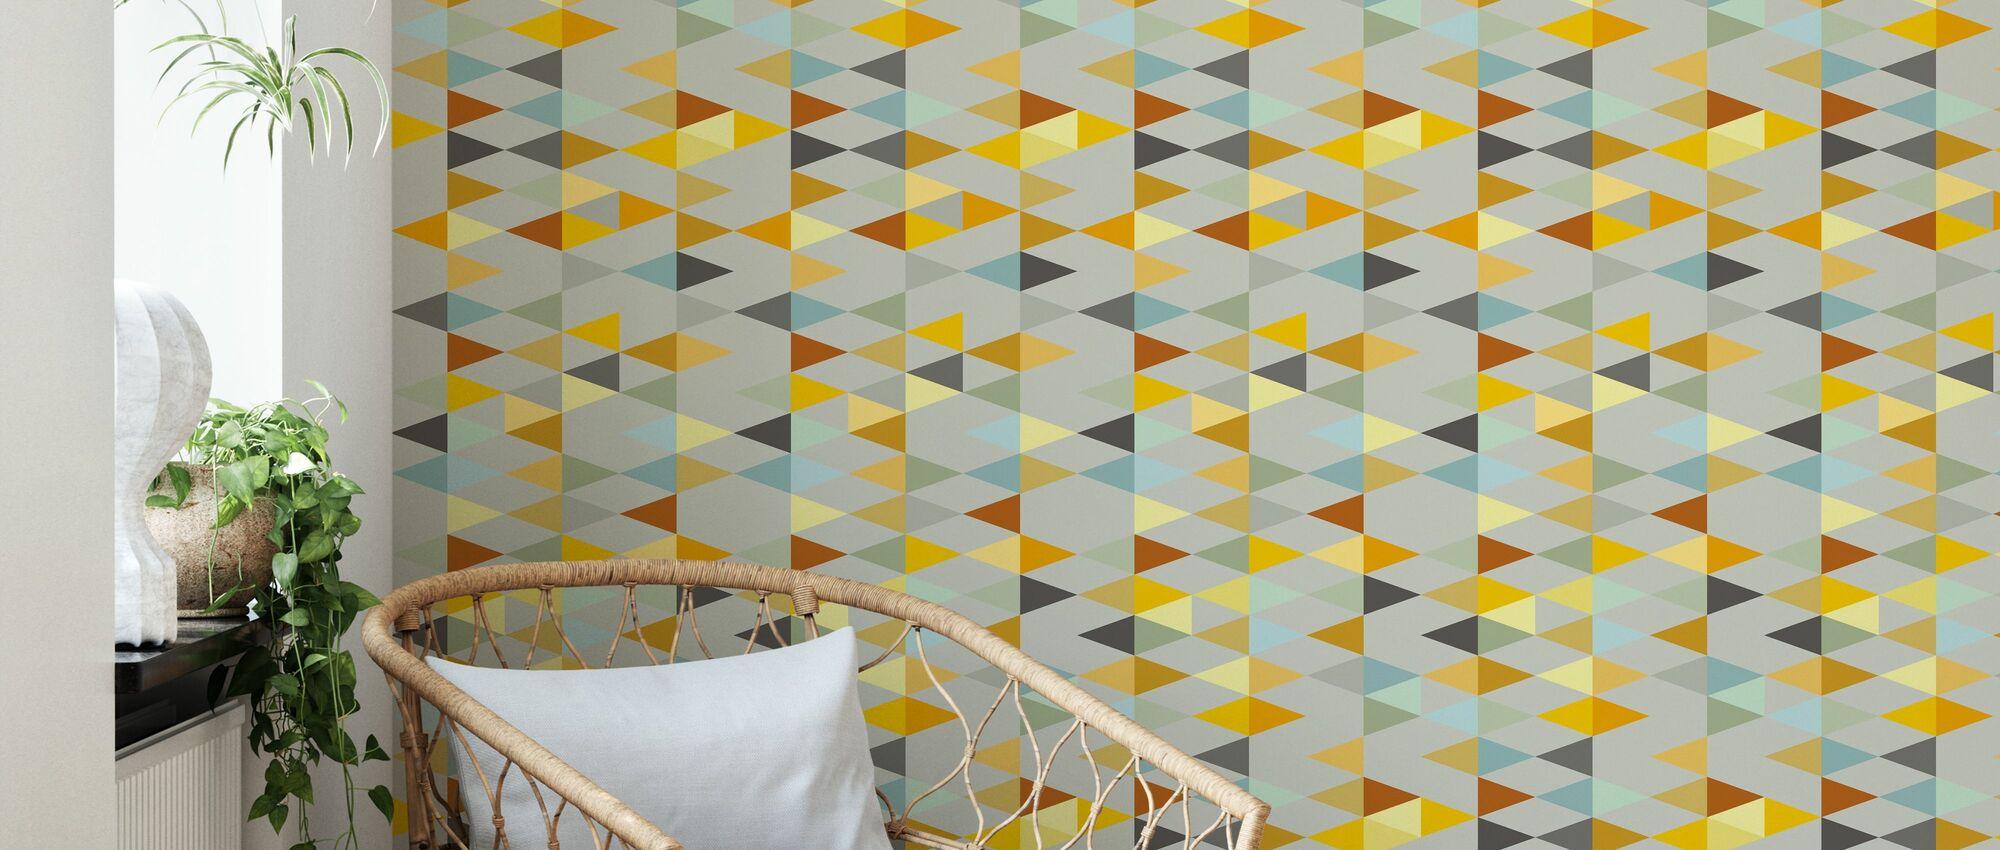 Twist Light - Wallpaper - Living Room